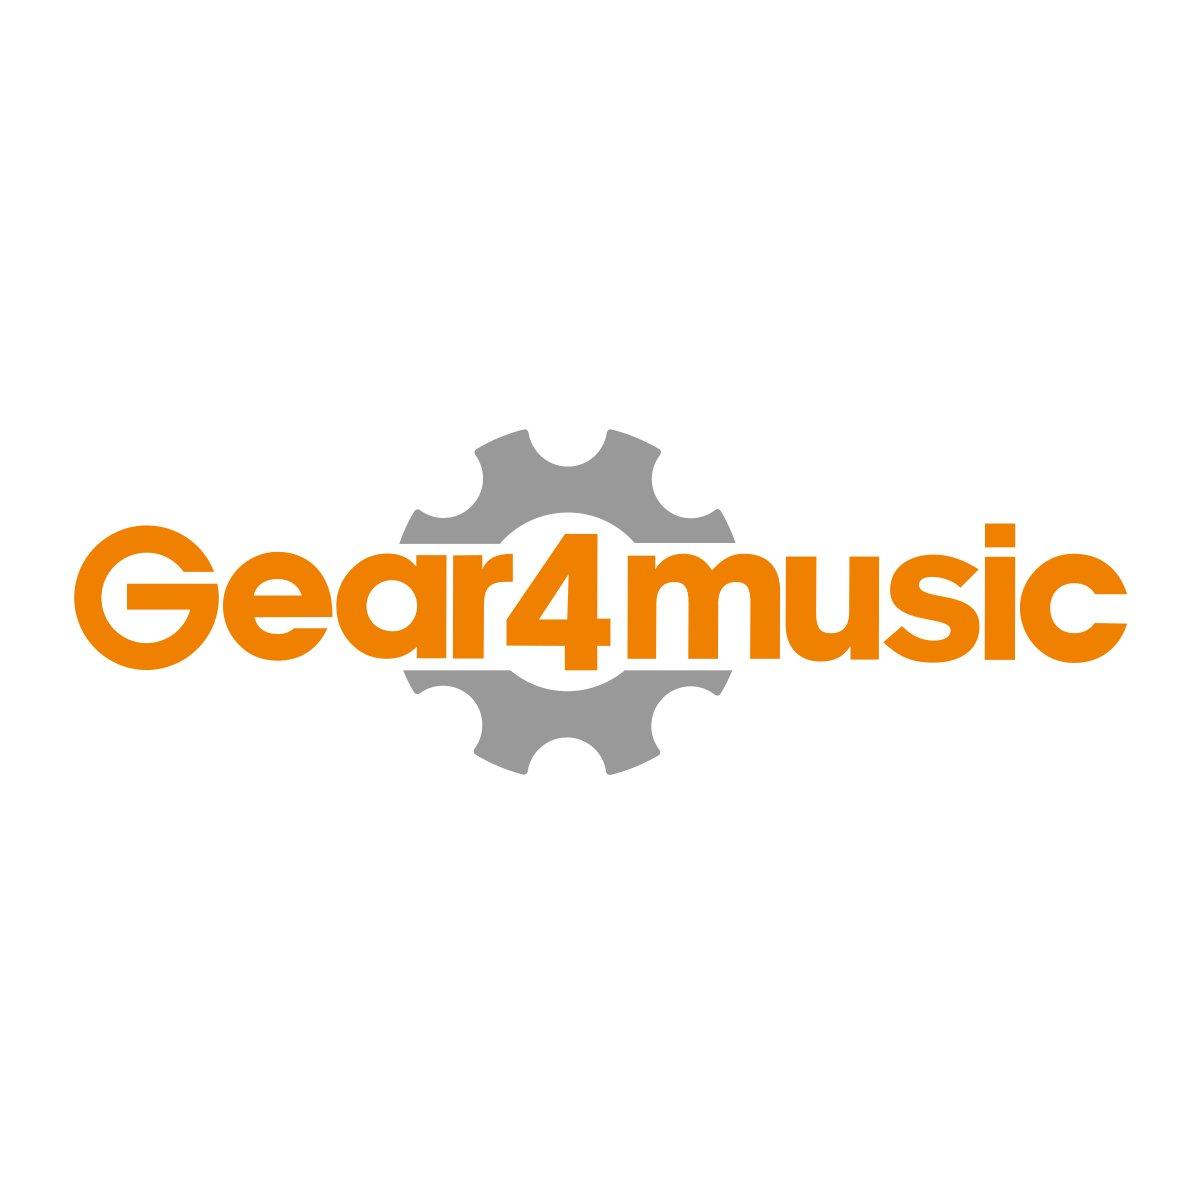 Remo Standard Buffalo Drum 3.5\'\' x 22\'\', White at Gear4music.com